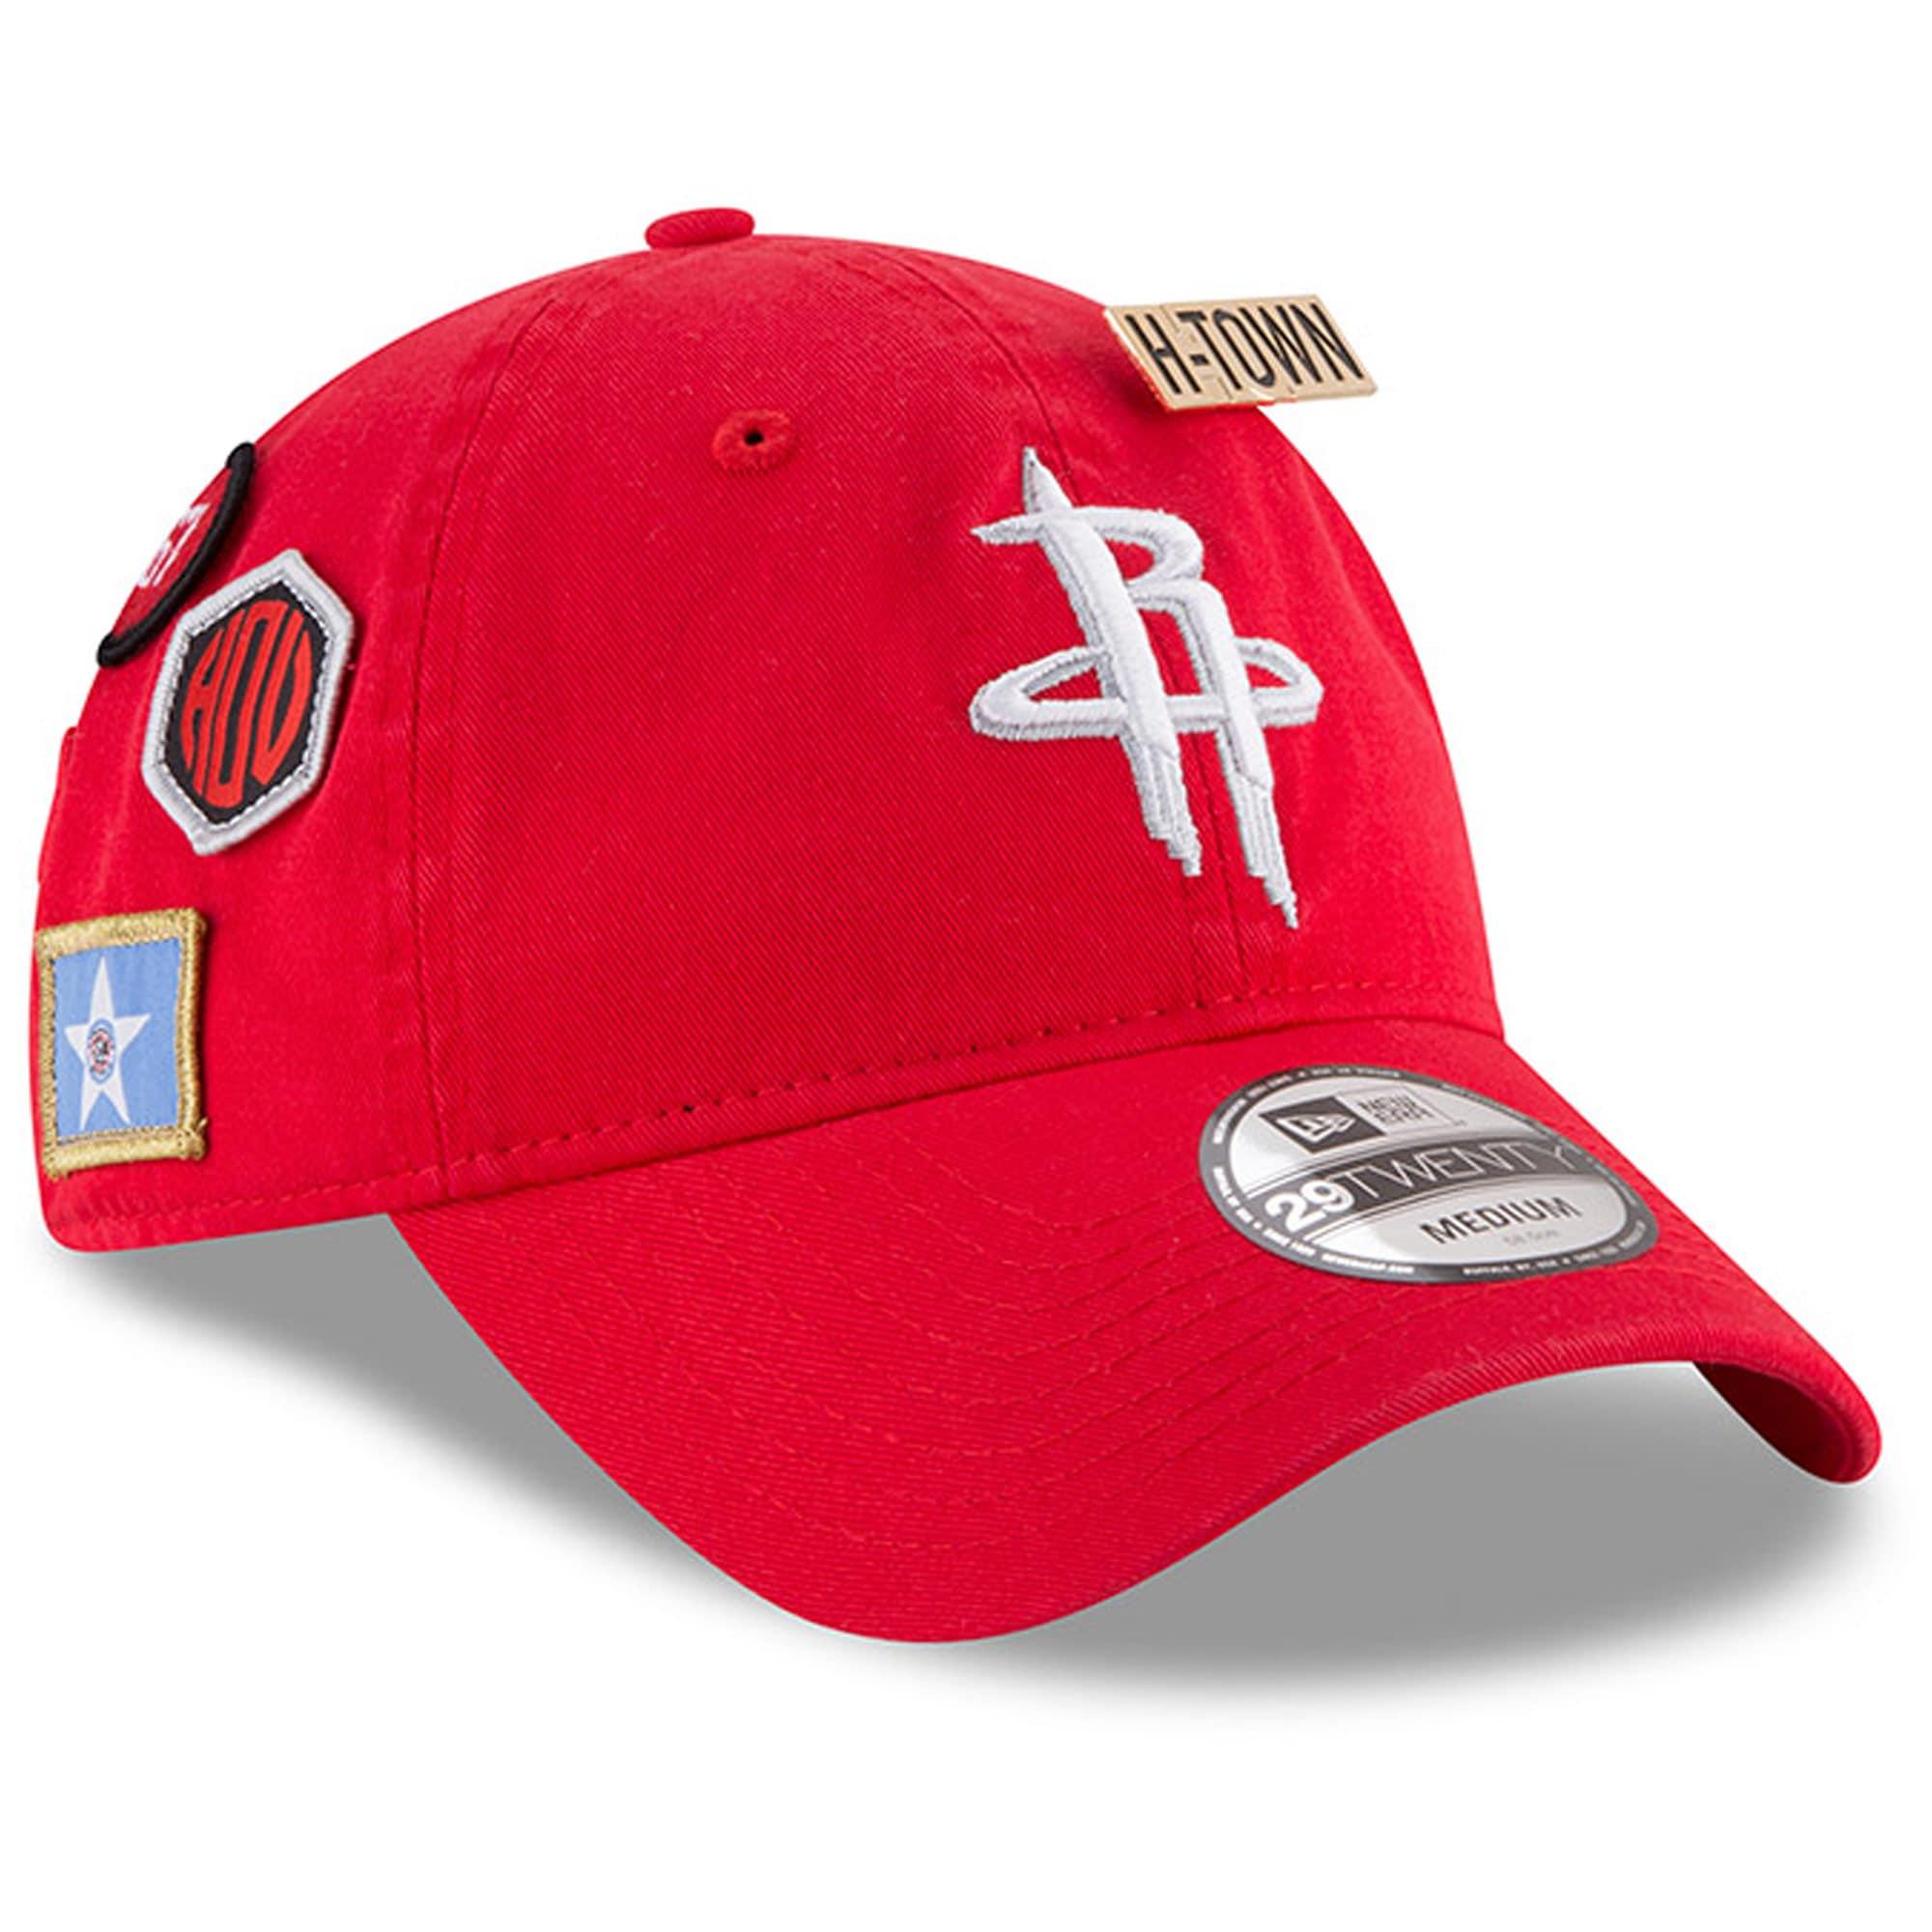 Houston Rockets New Era 2018 Draft 29TWENTY Fitted Hat - Red